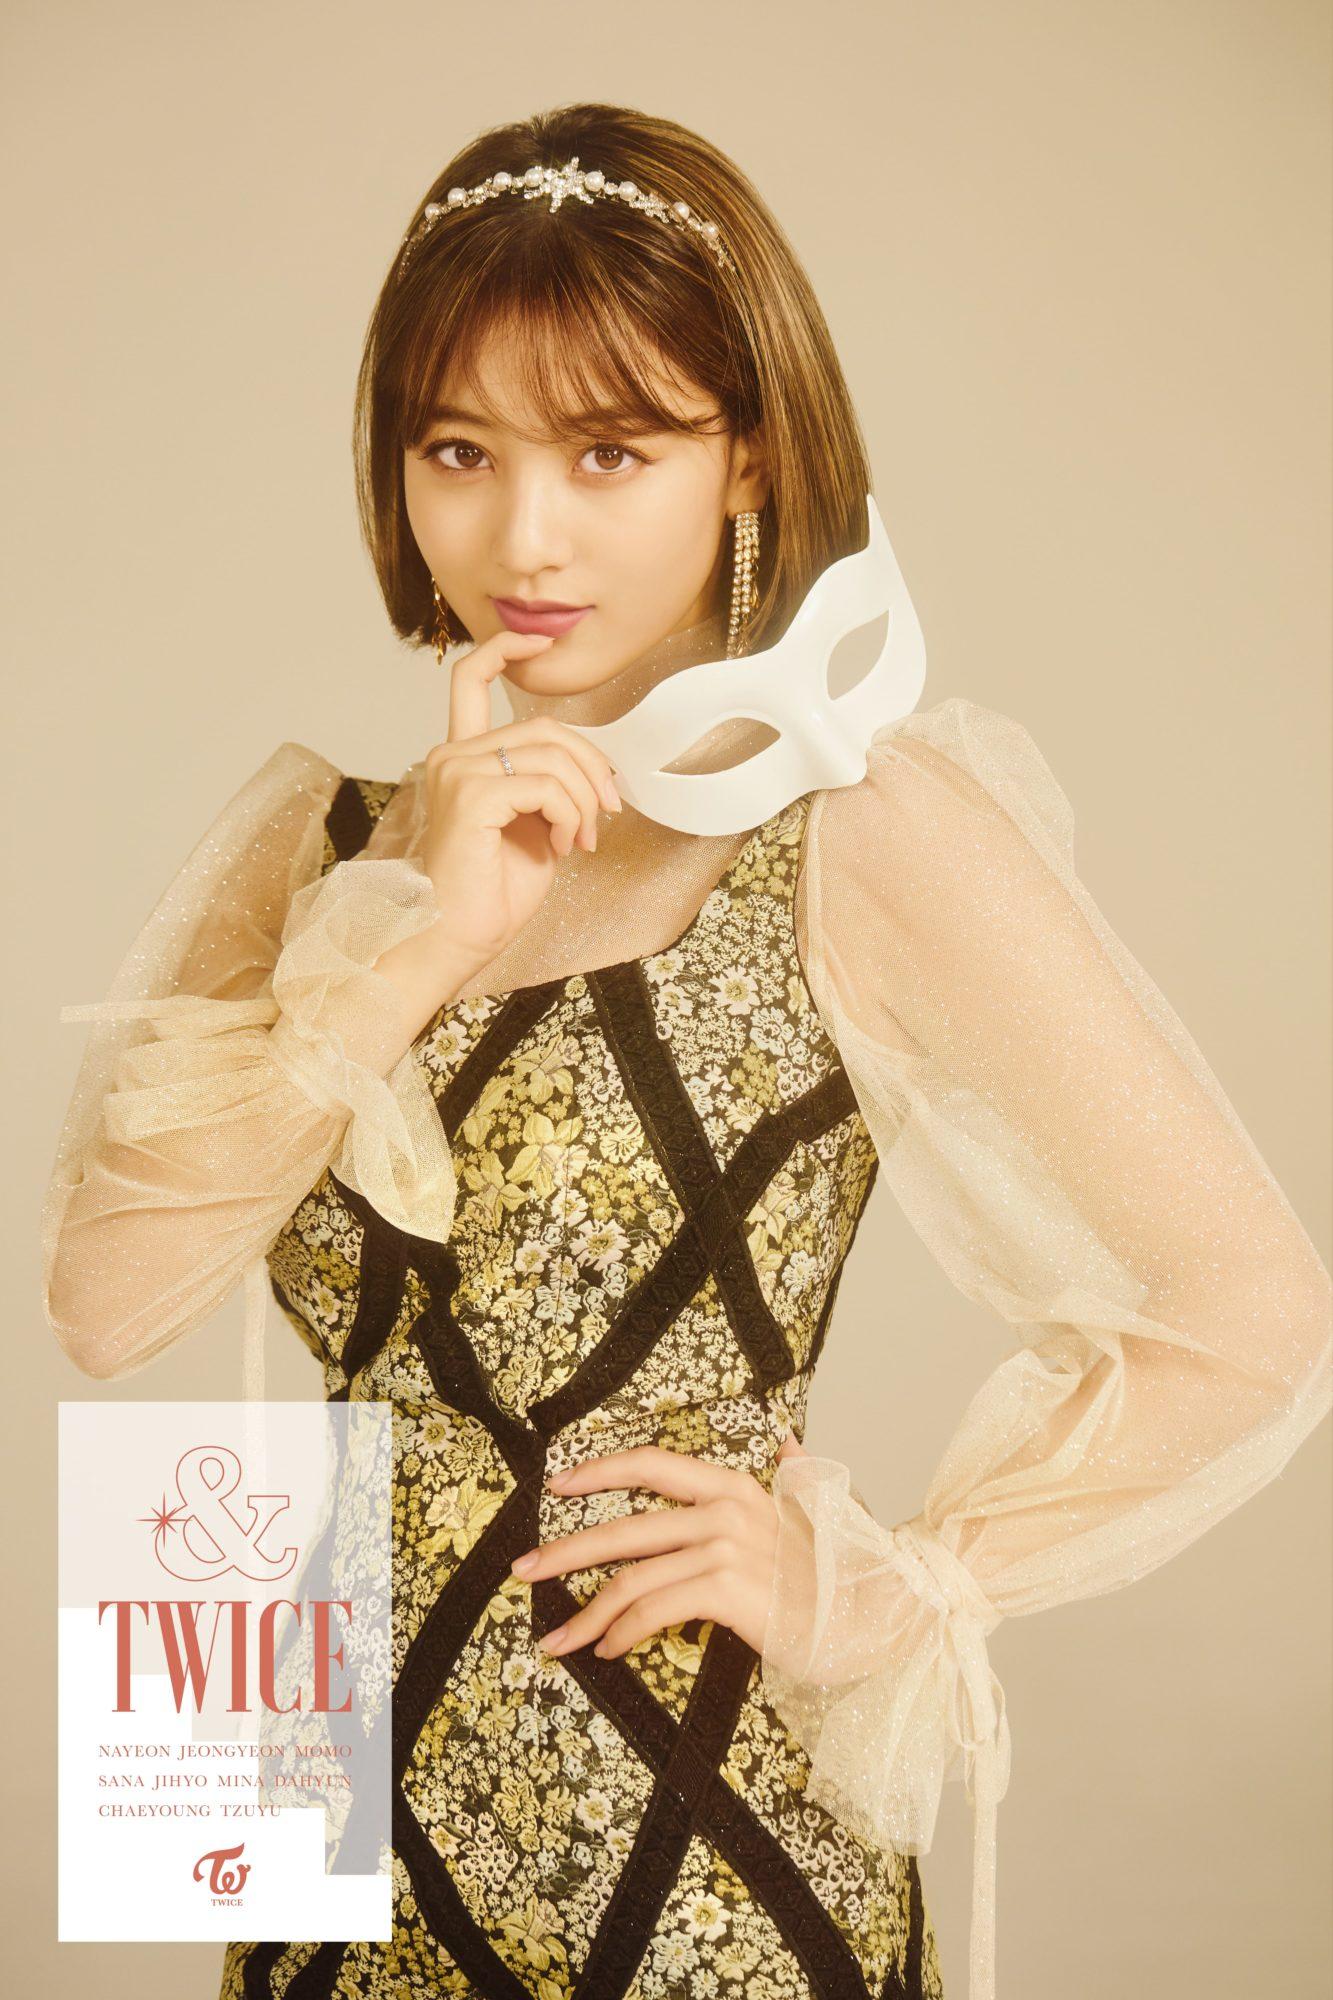 Twice &Twice Concept Jihyo